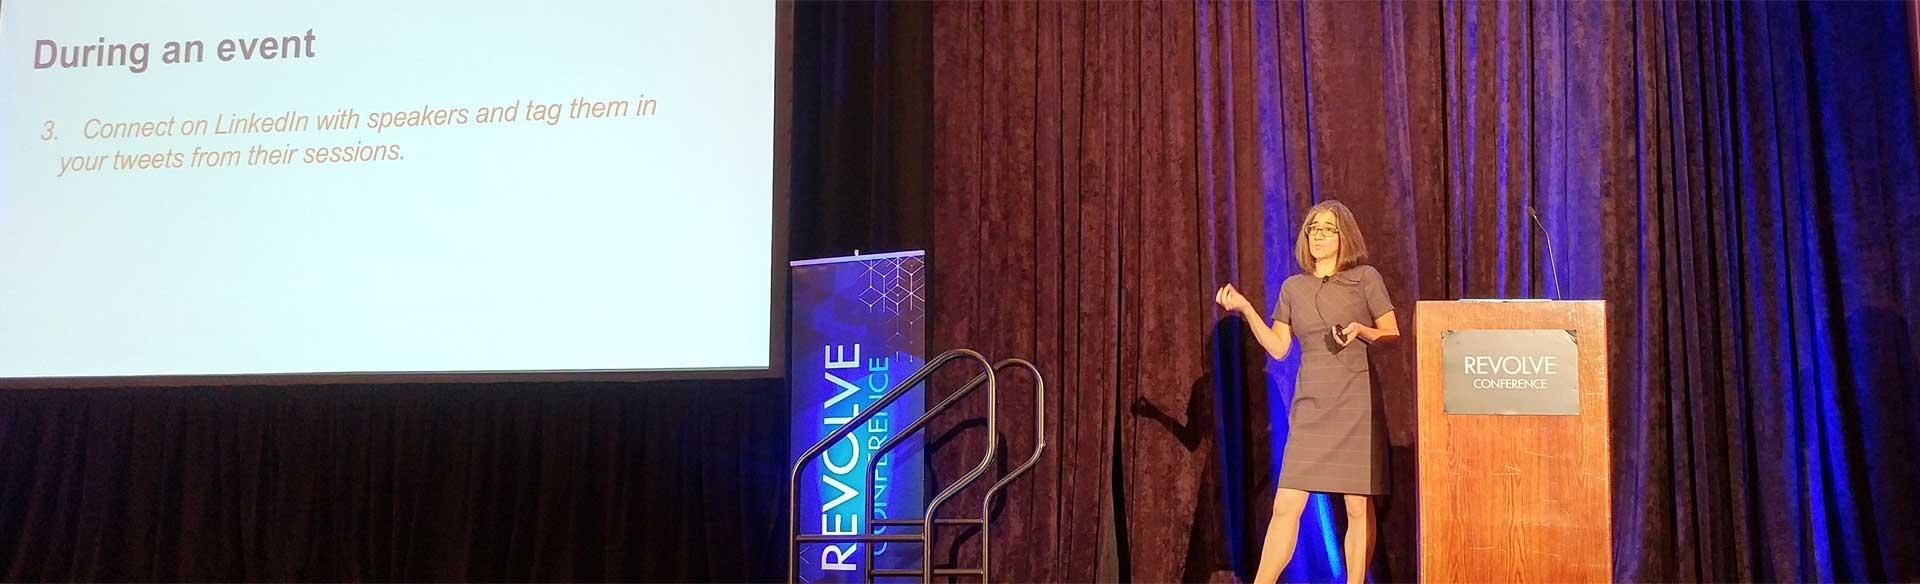 Ilise Benun at Revolve Conference 2017